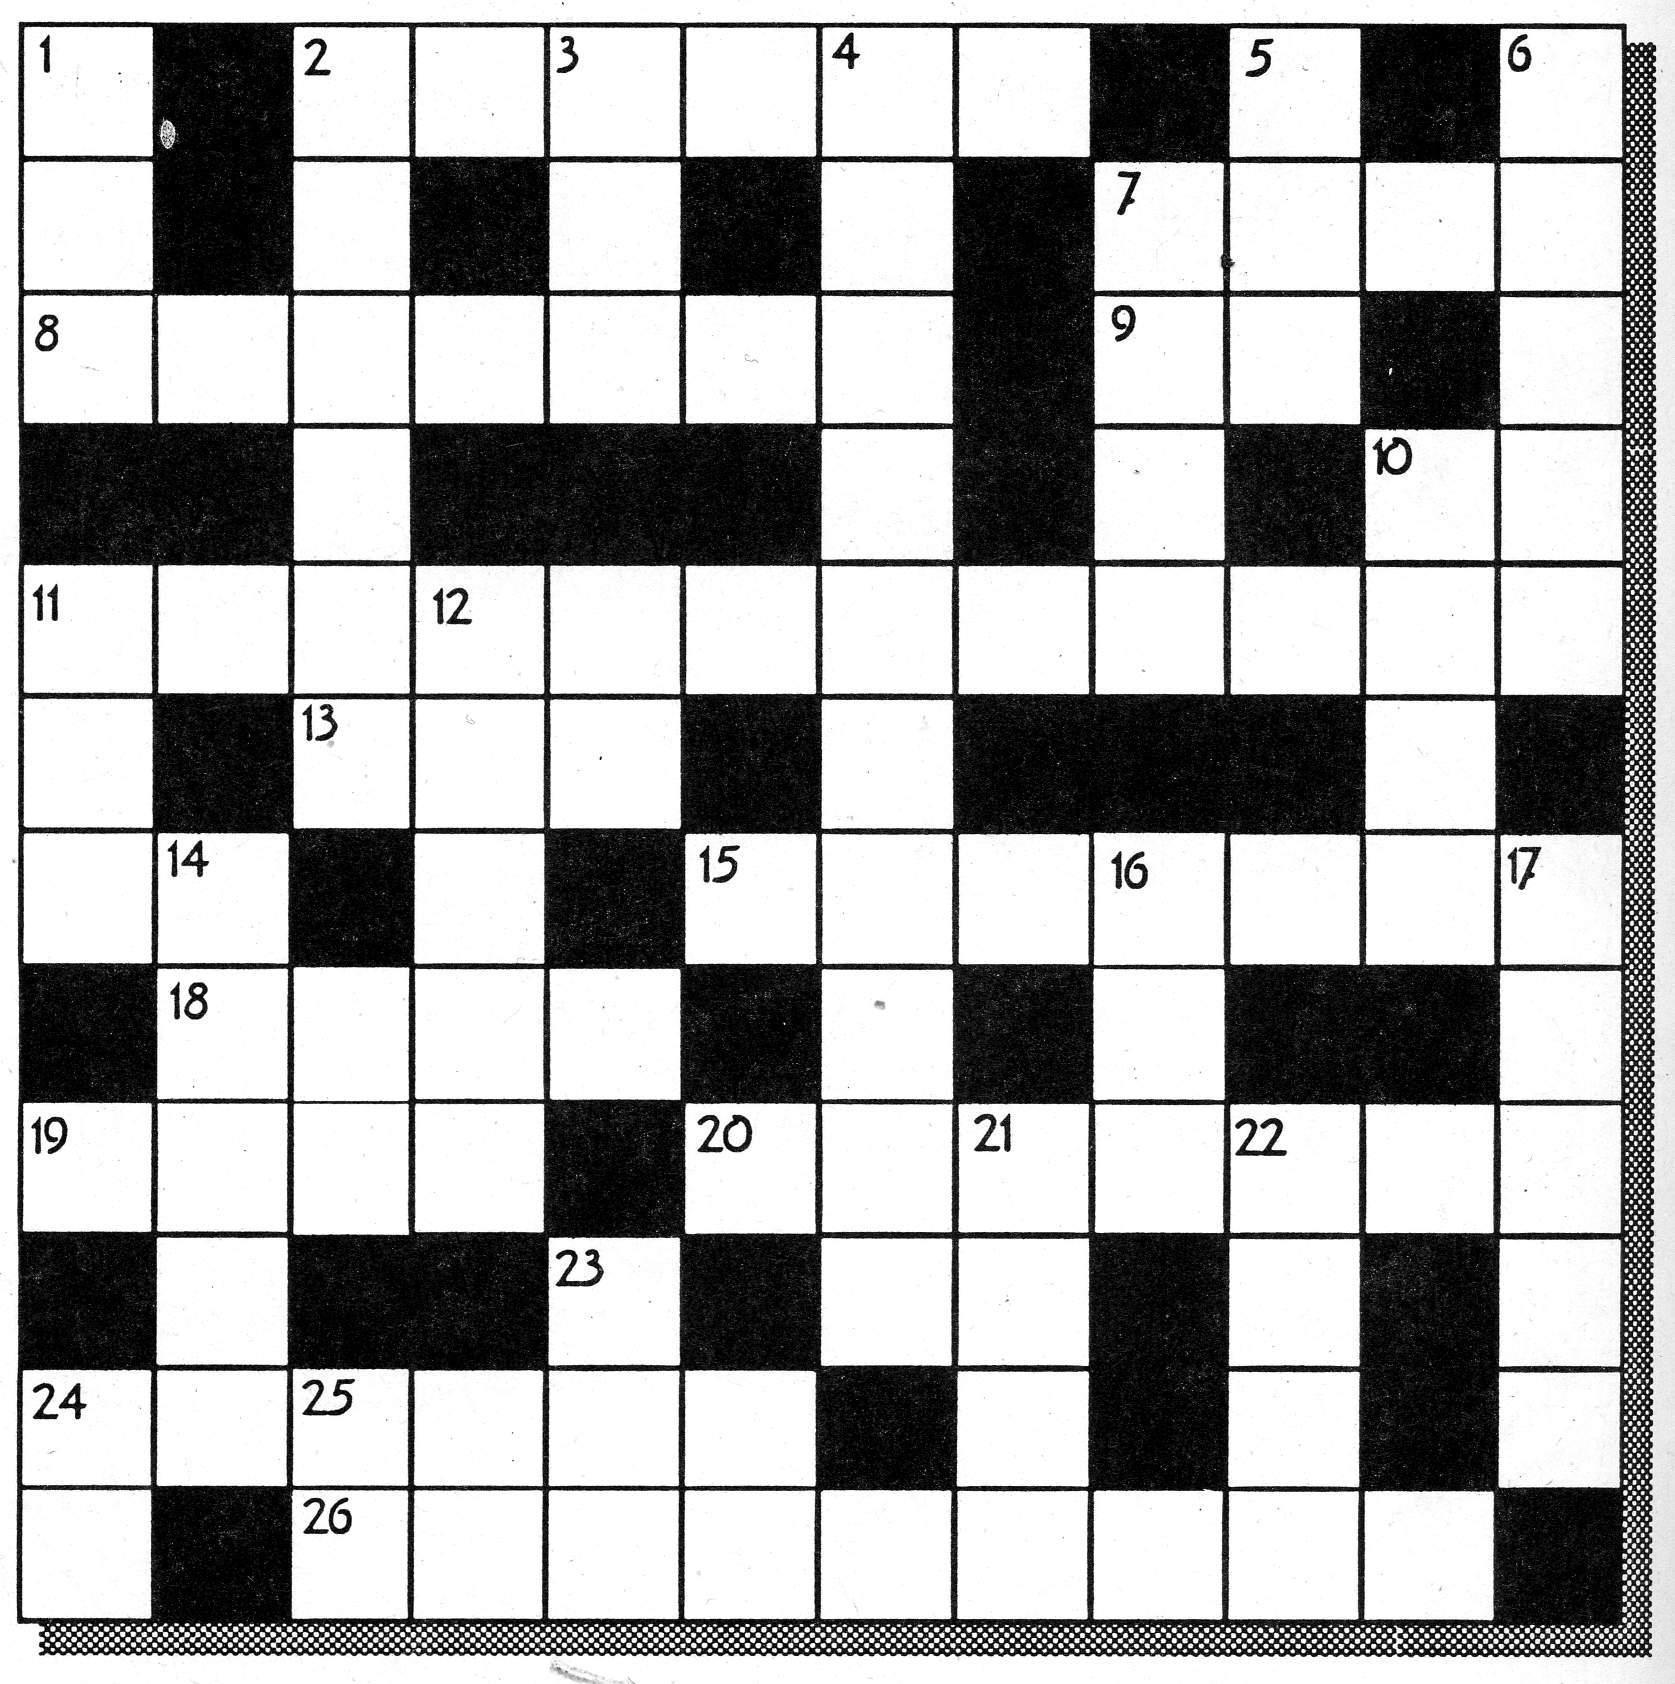 Olympic crossword | sport vocabulary crossword